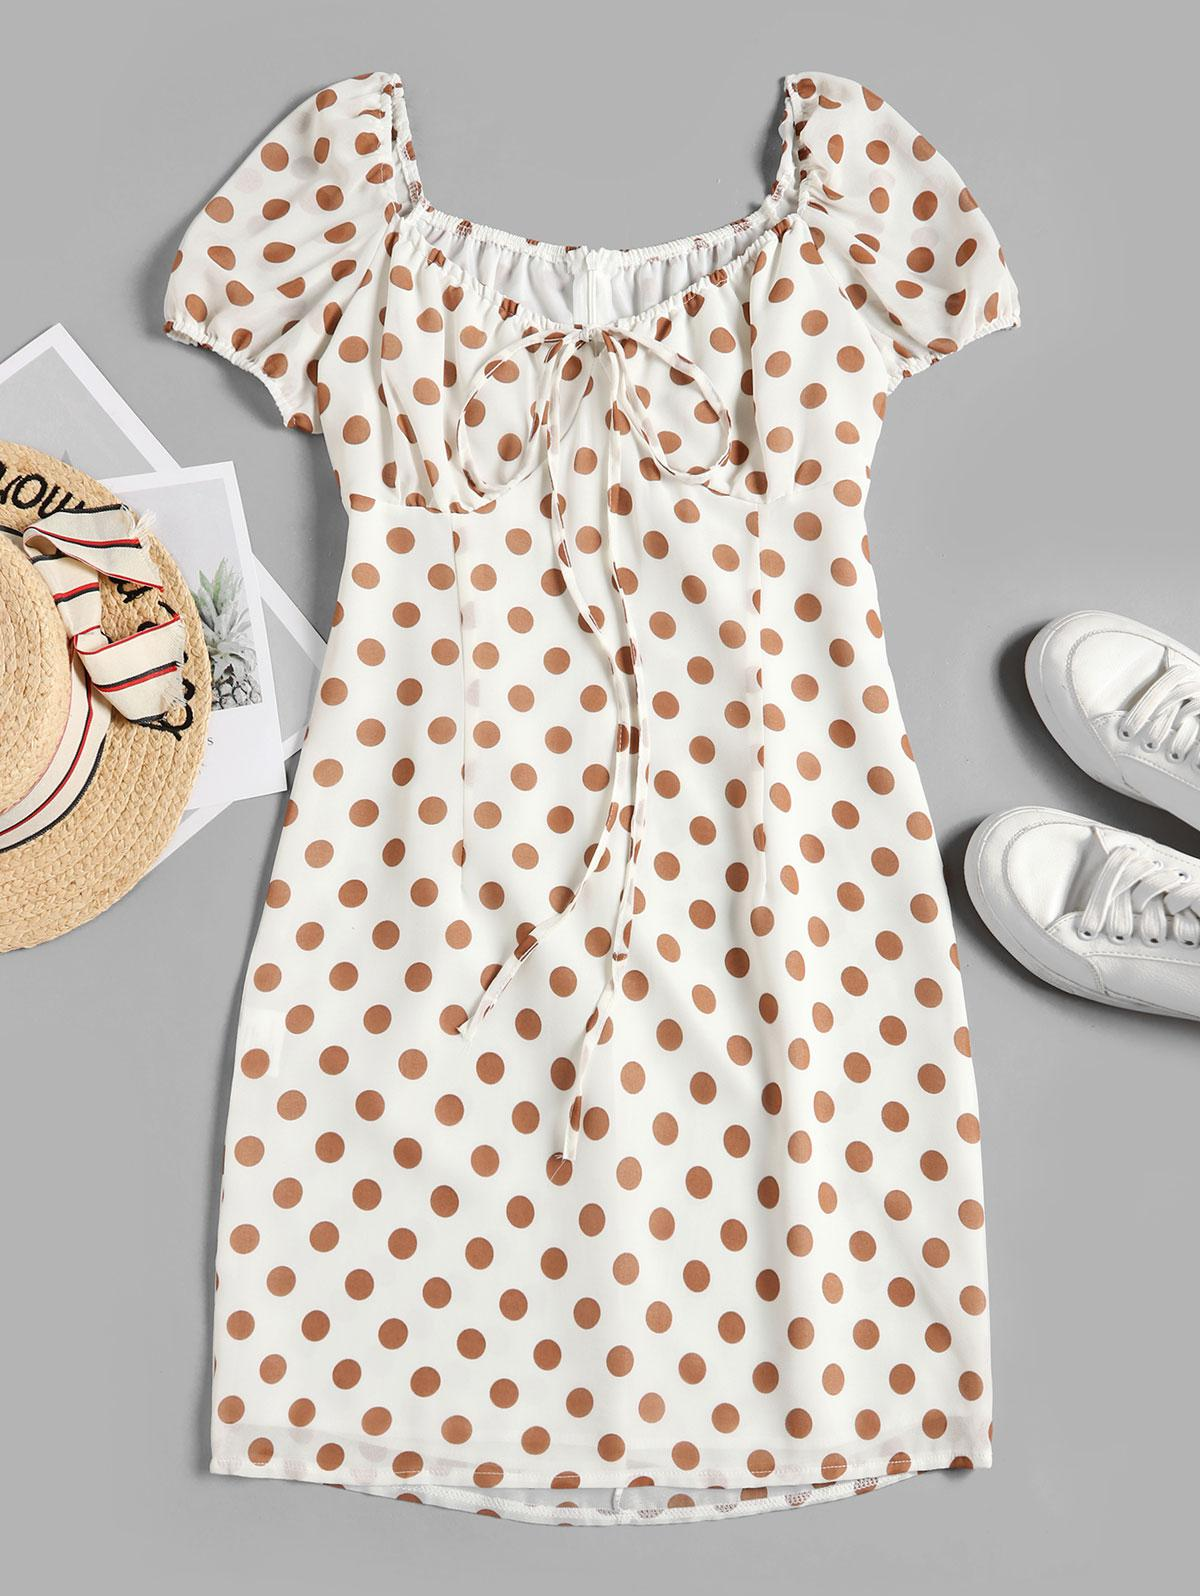 Tied Polka Dot A Line Dress